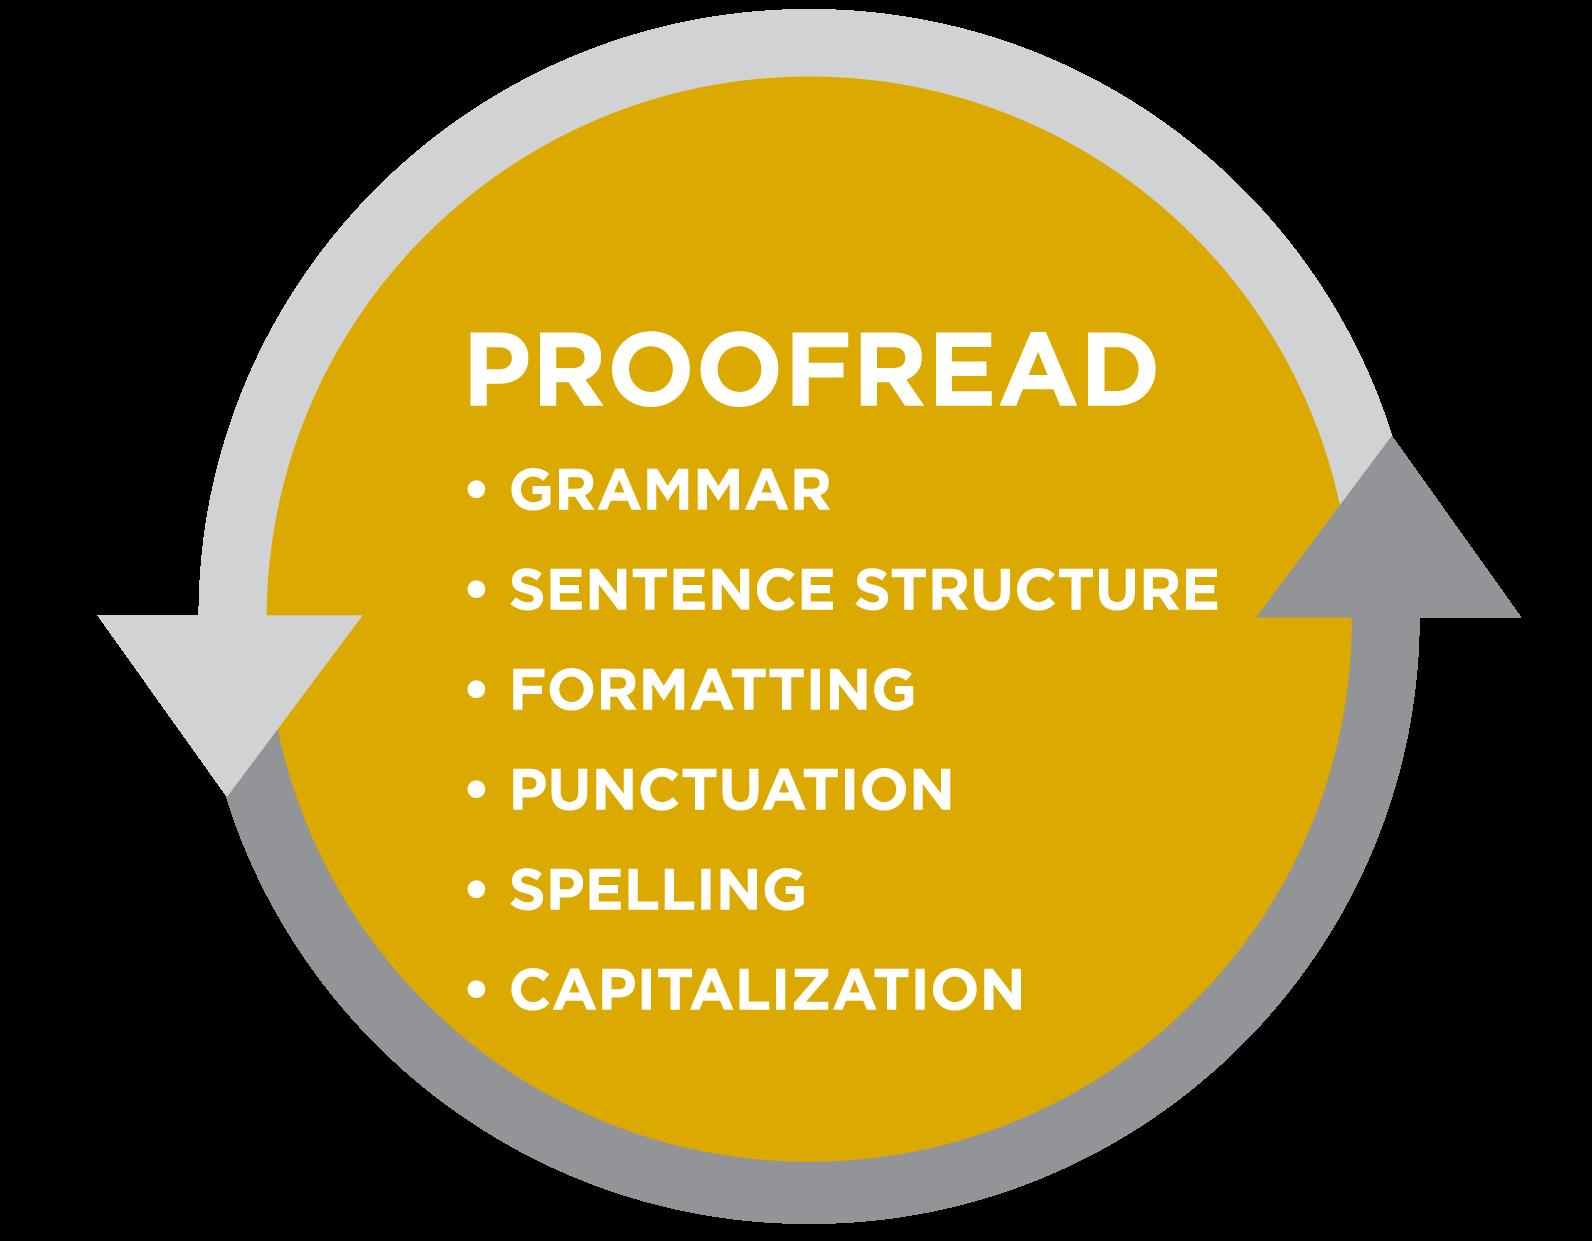 cara proofreading tesis